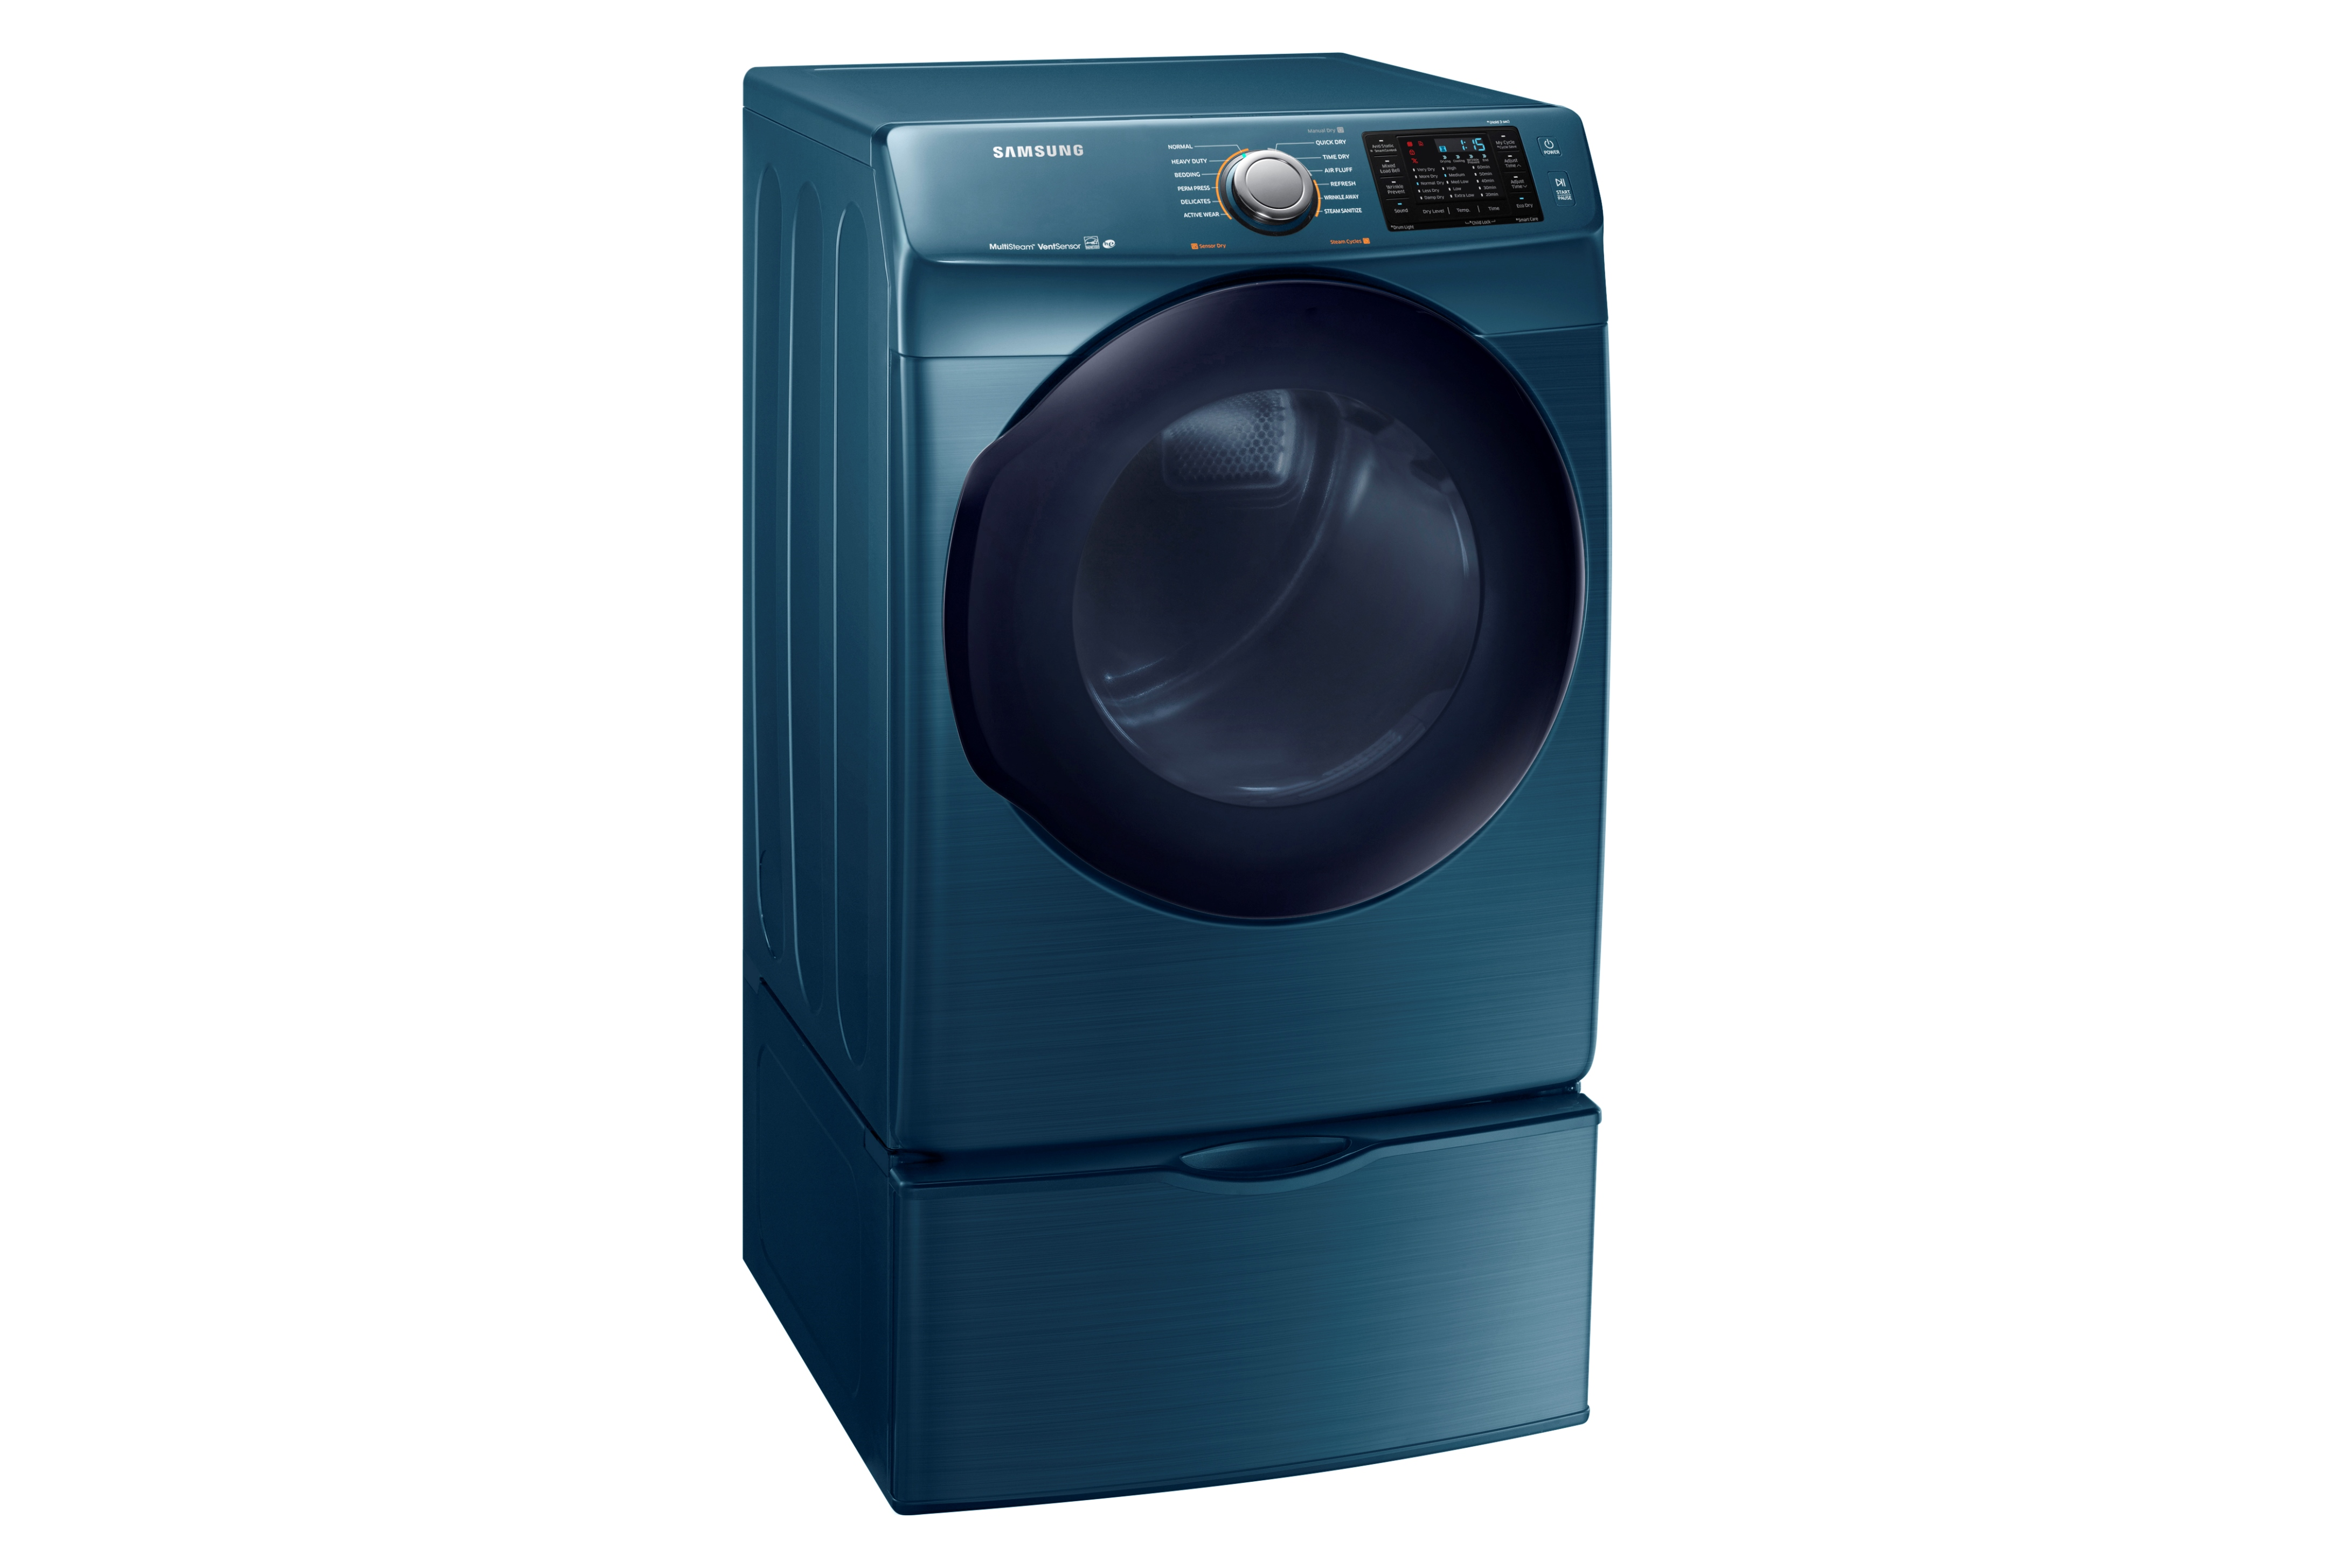 Samsung DV45K6200EZ 7.5 cu. ft. Capacity Electric Dryer Azure Blue